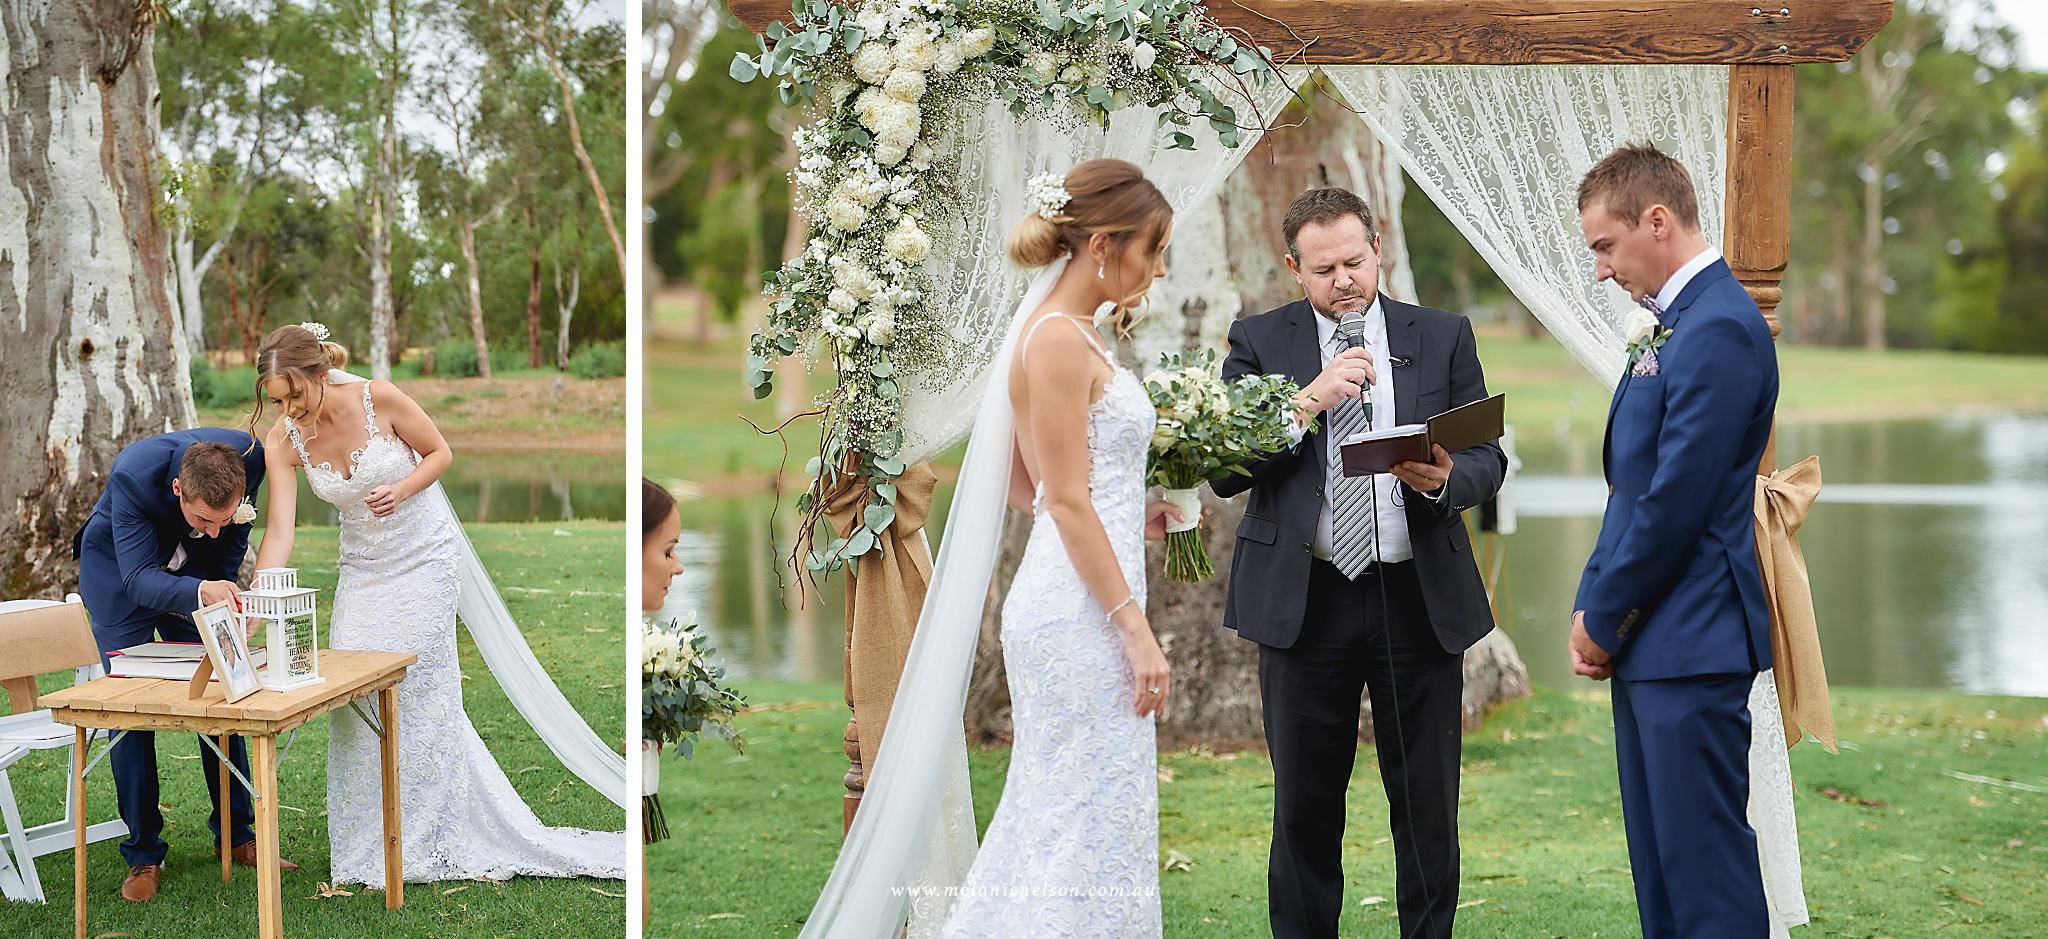 serafino_wedding_photography_0031.jpg